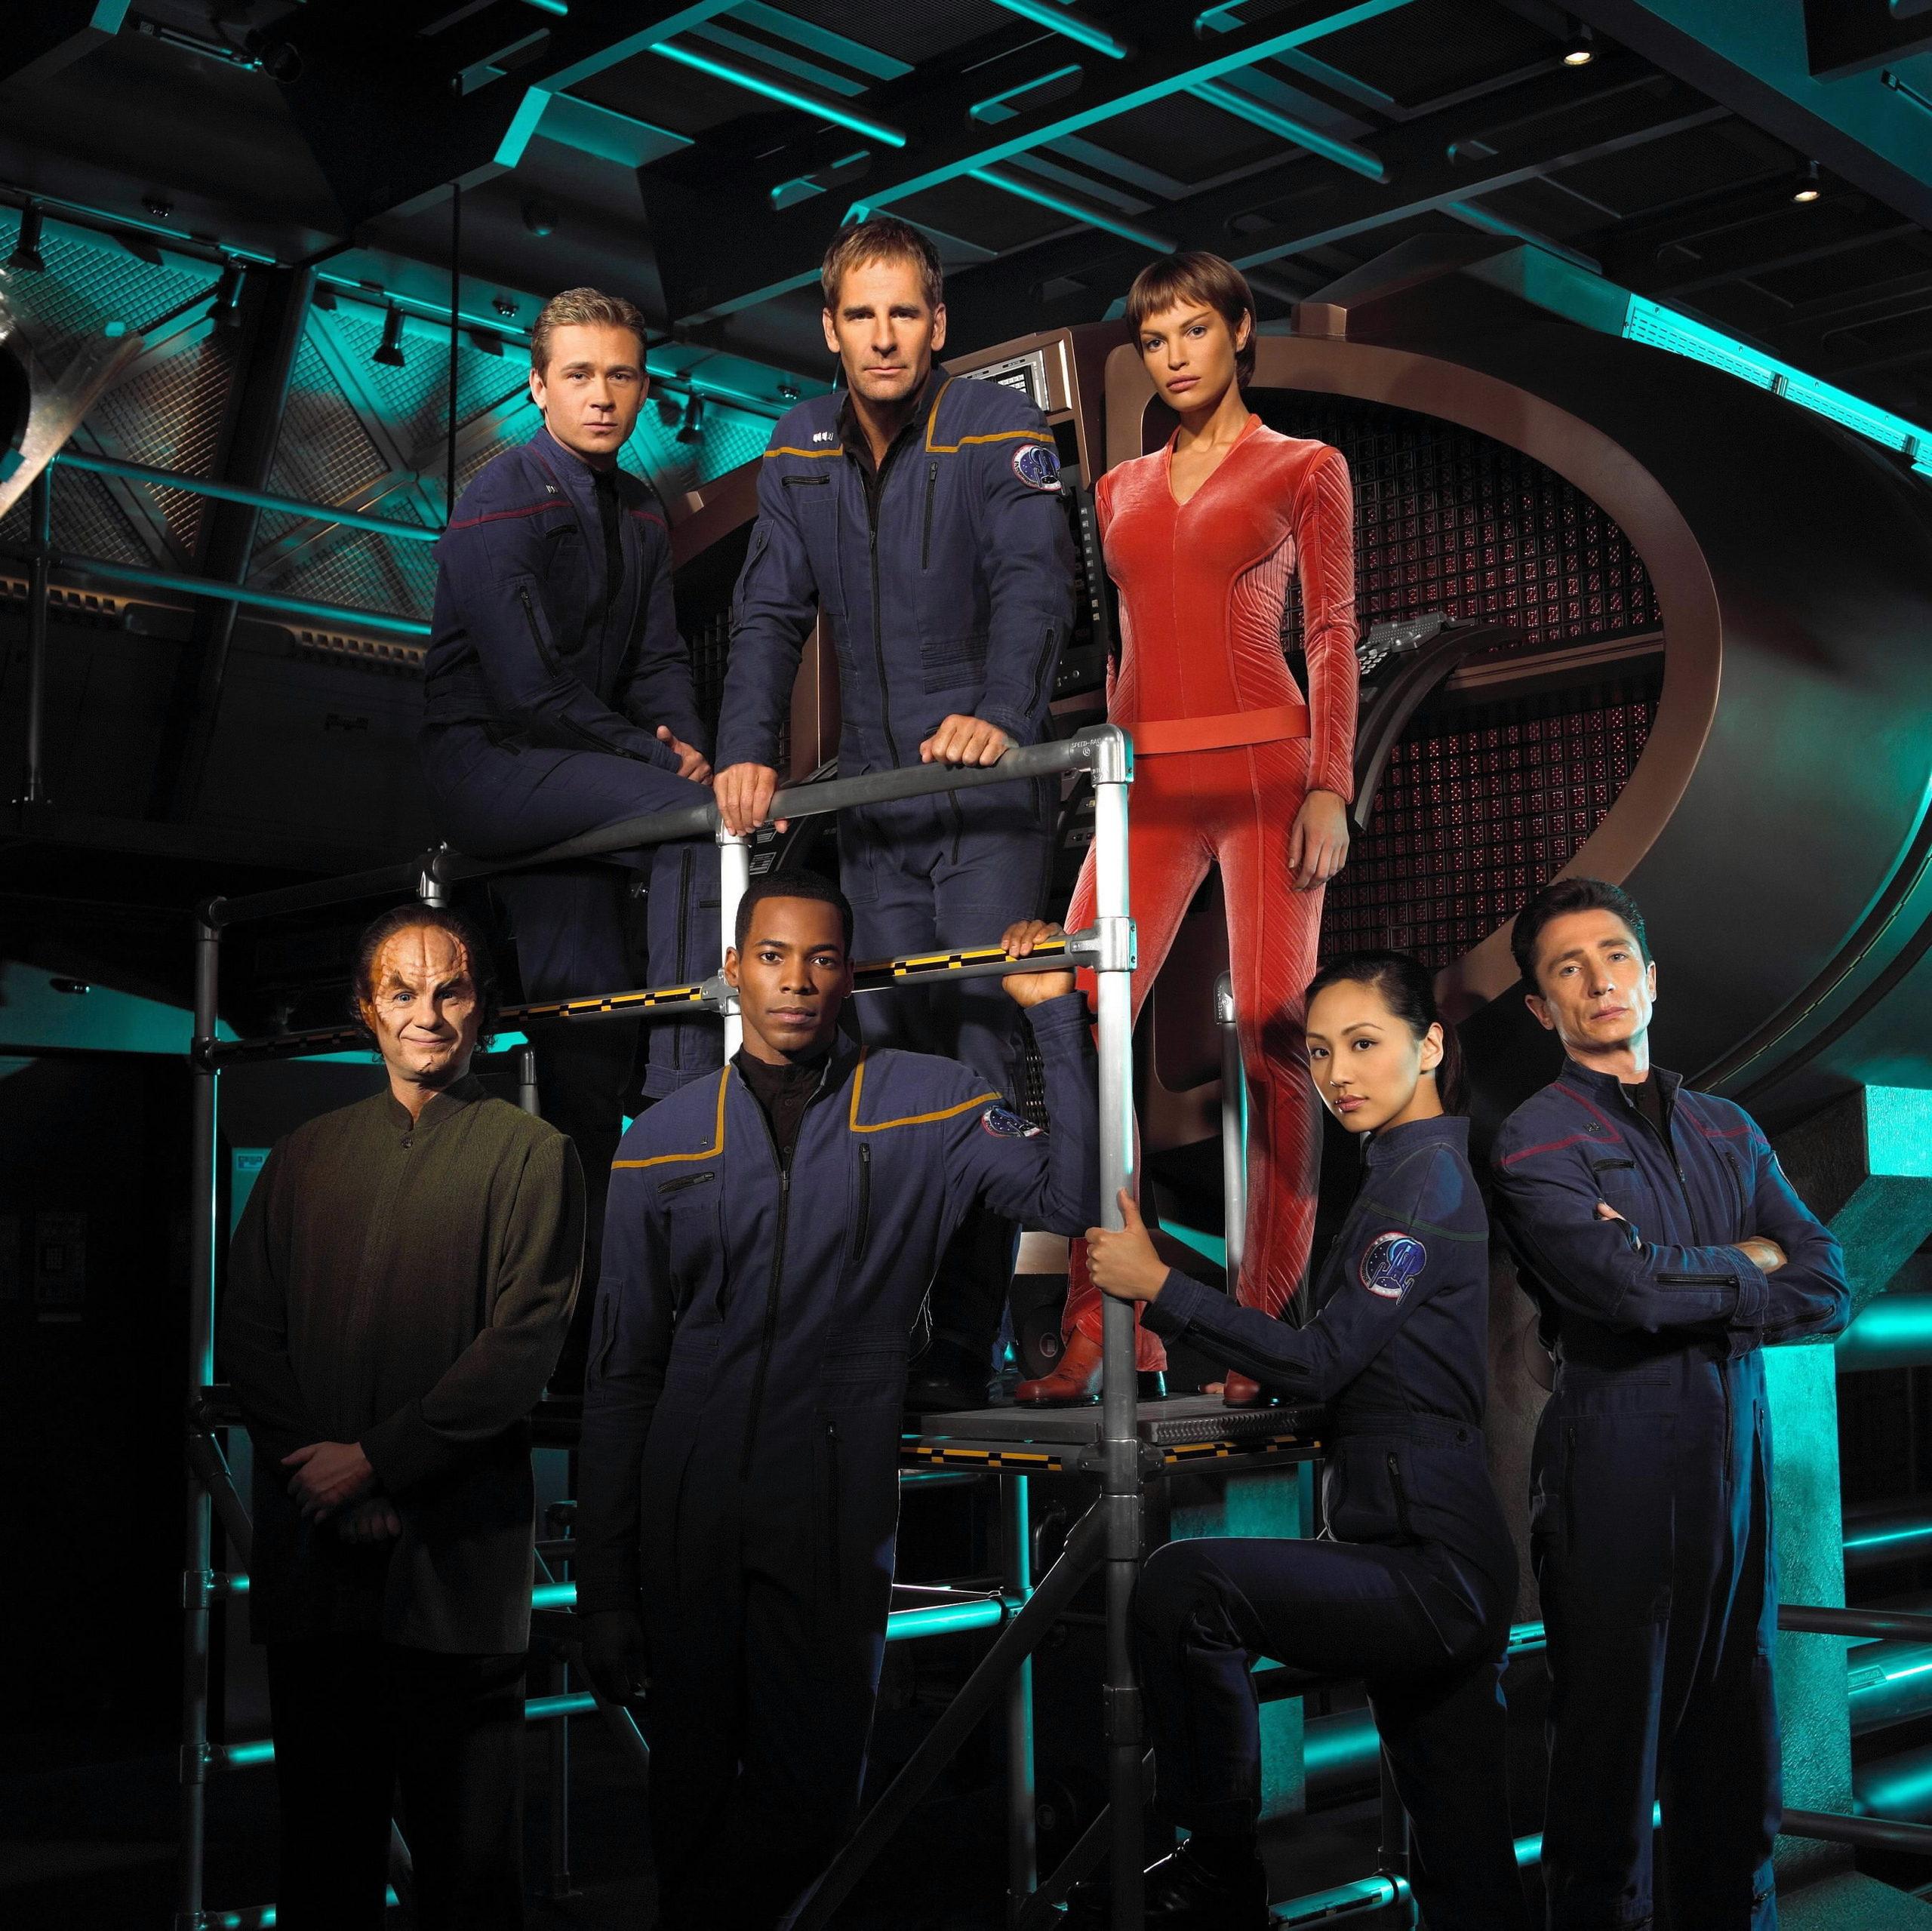 star-trek-enterprise-cast-star-trek-enterprise-7651373-2560-2559_1.jpg